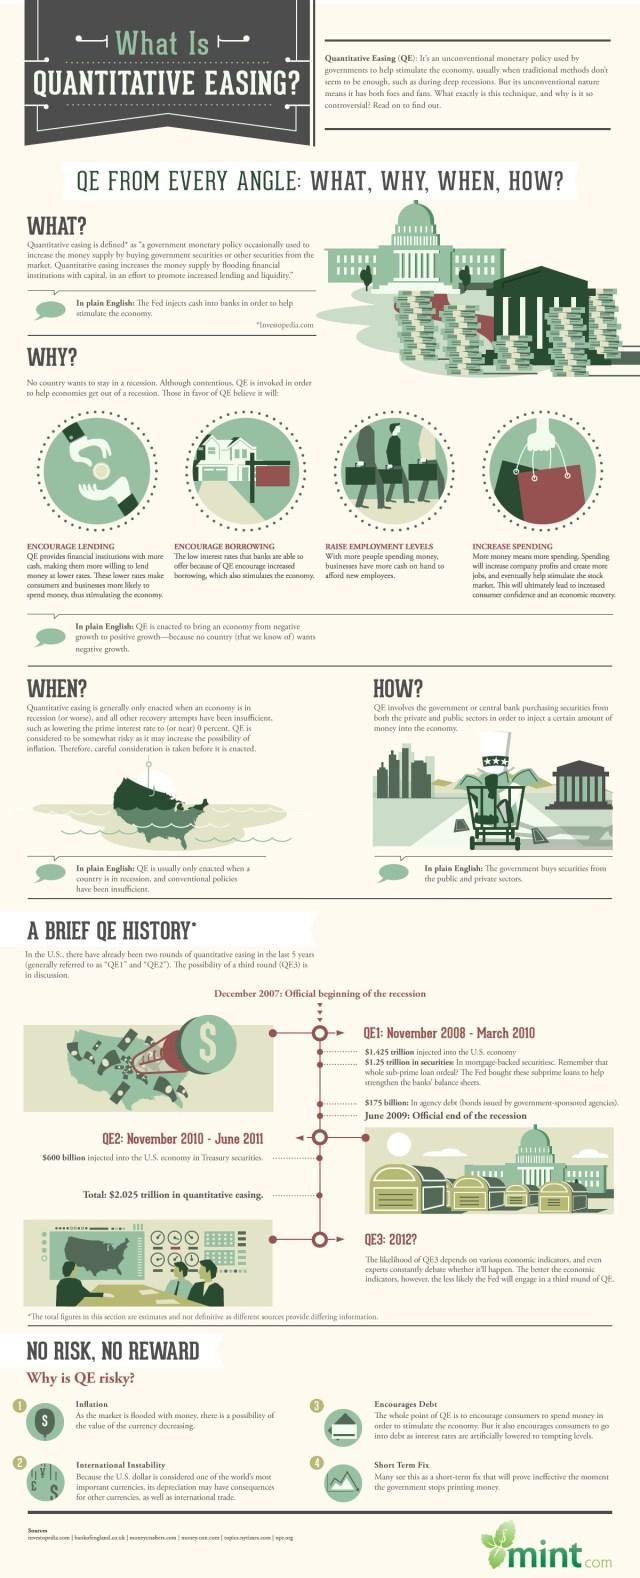 Quantitative Easing info